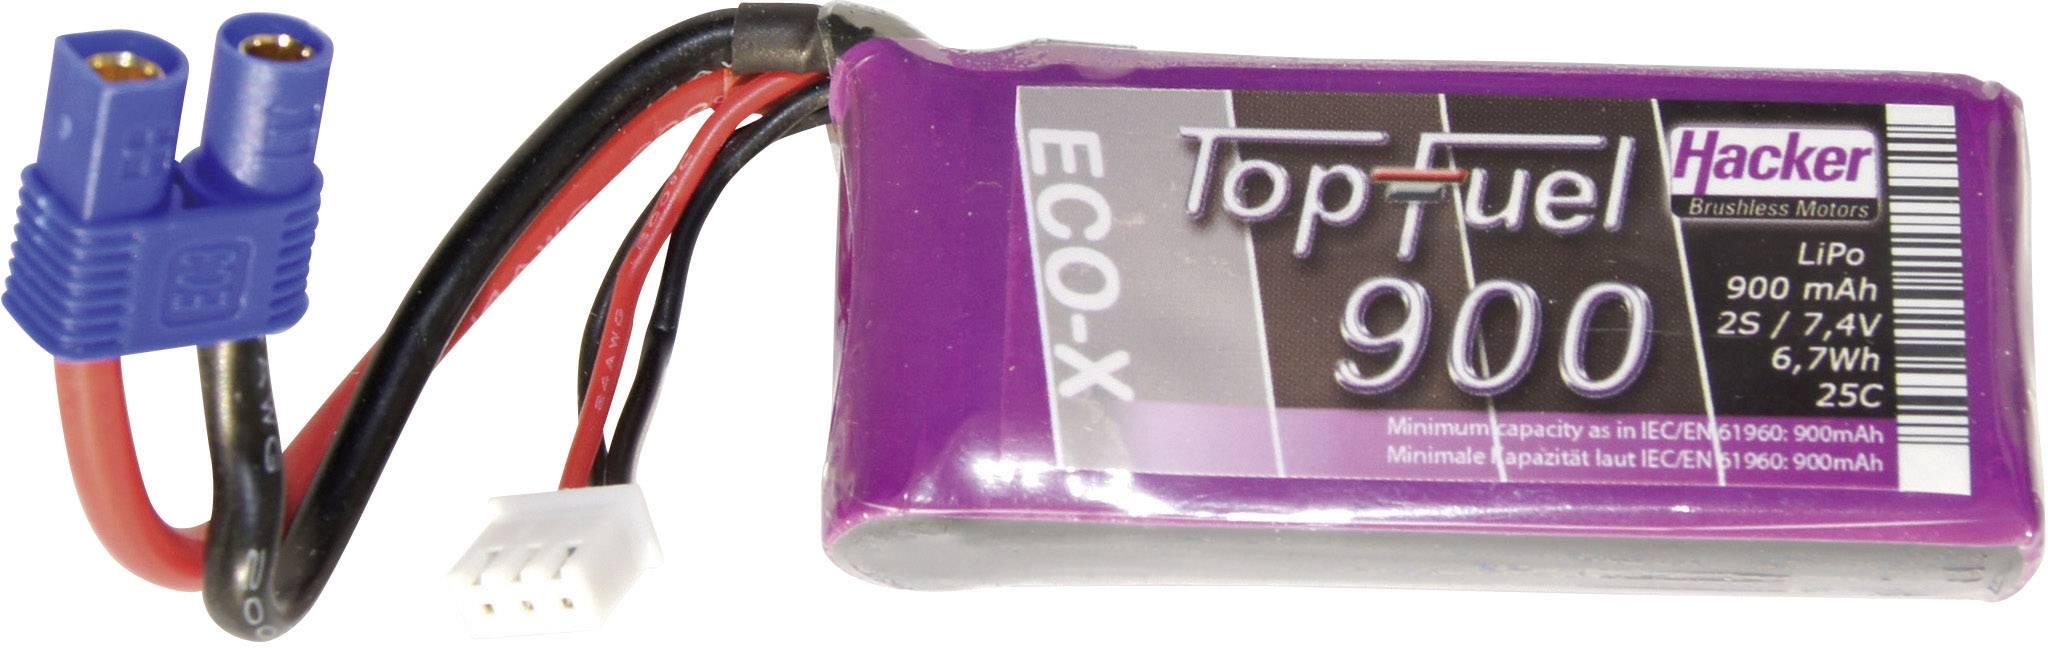 Akupack Li-Pol Hacker 20900241, 7.4 V, 900 mAh